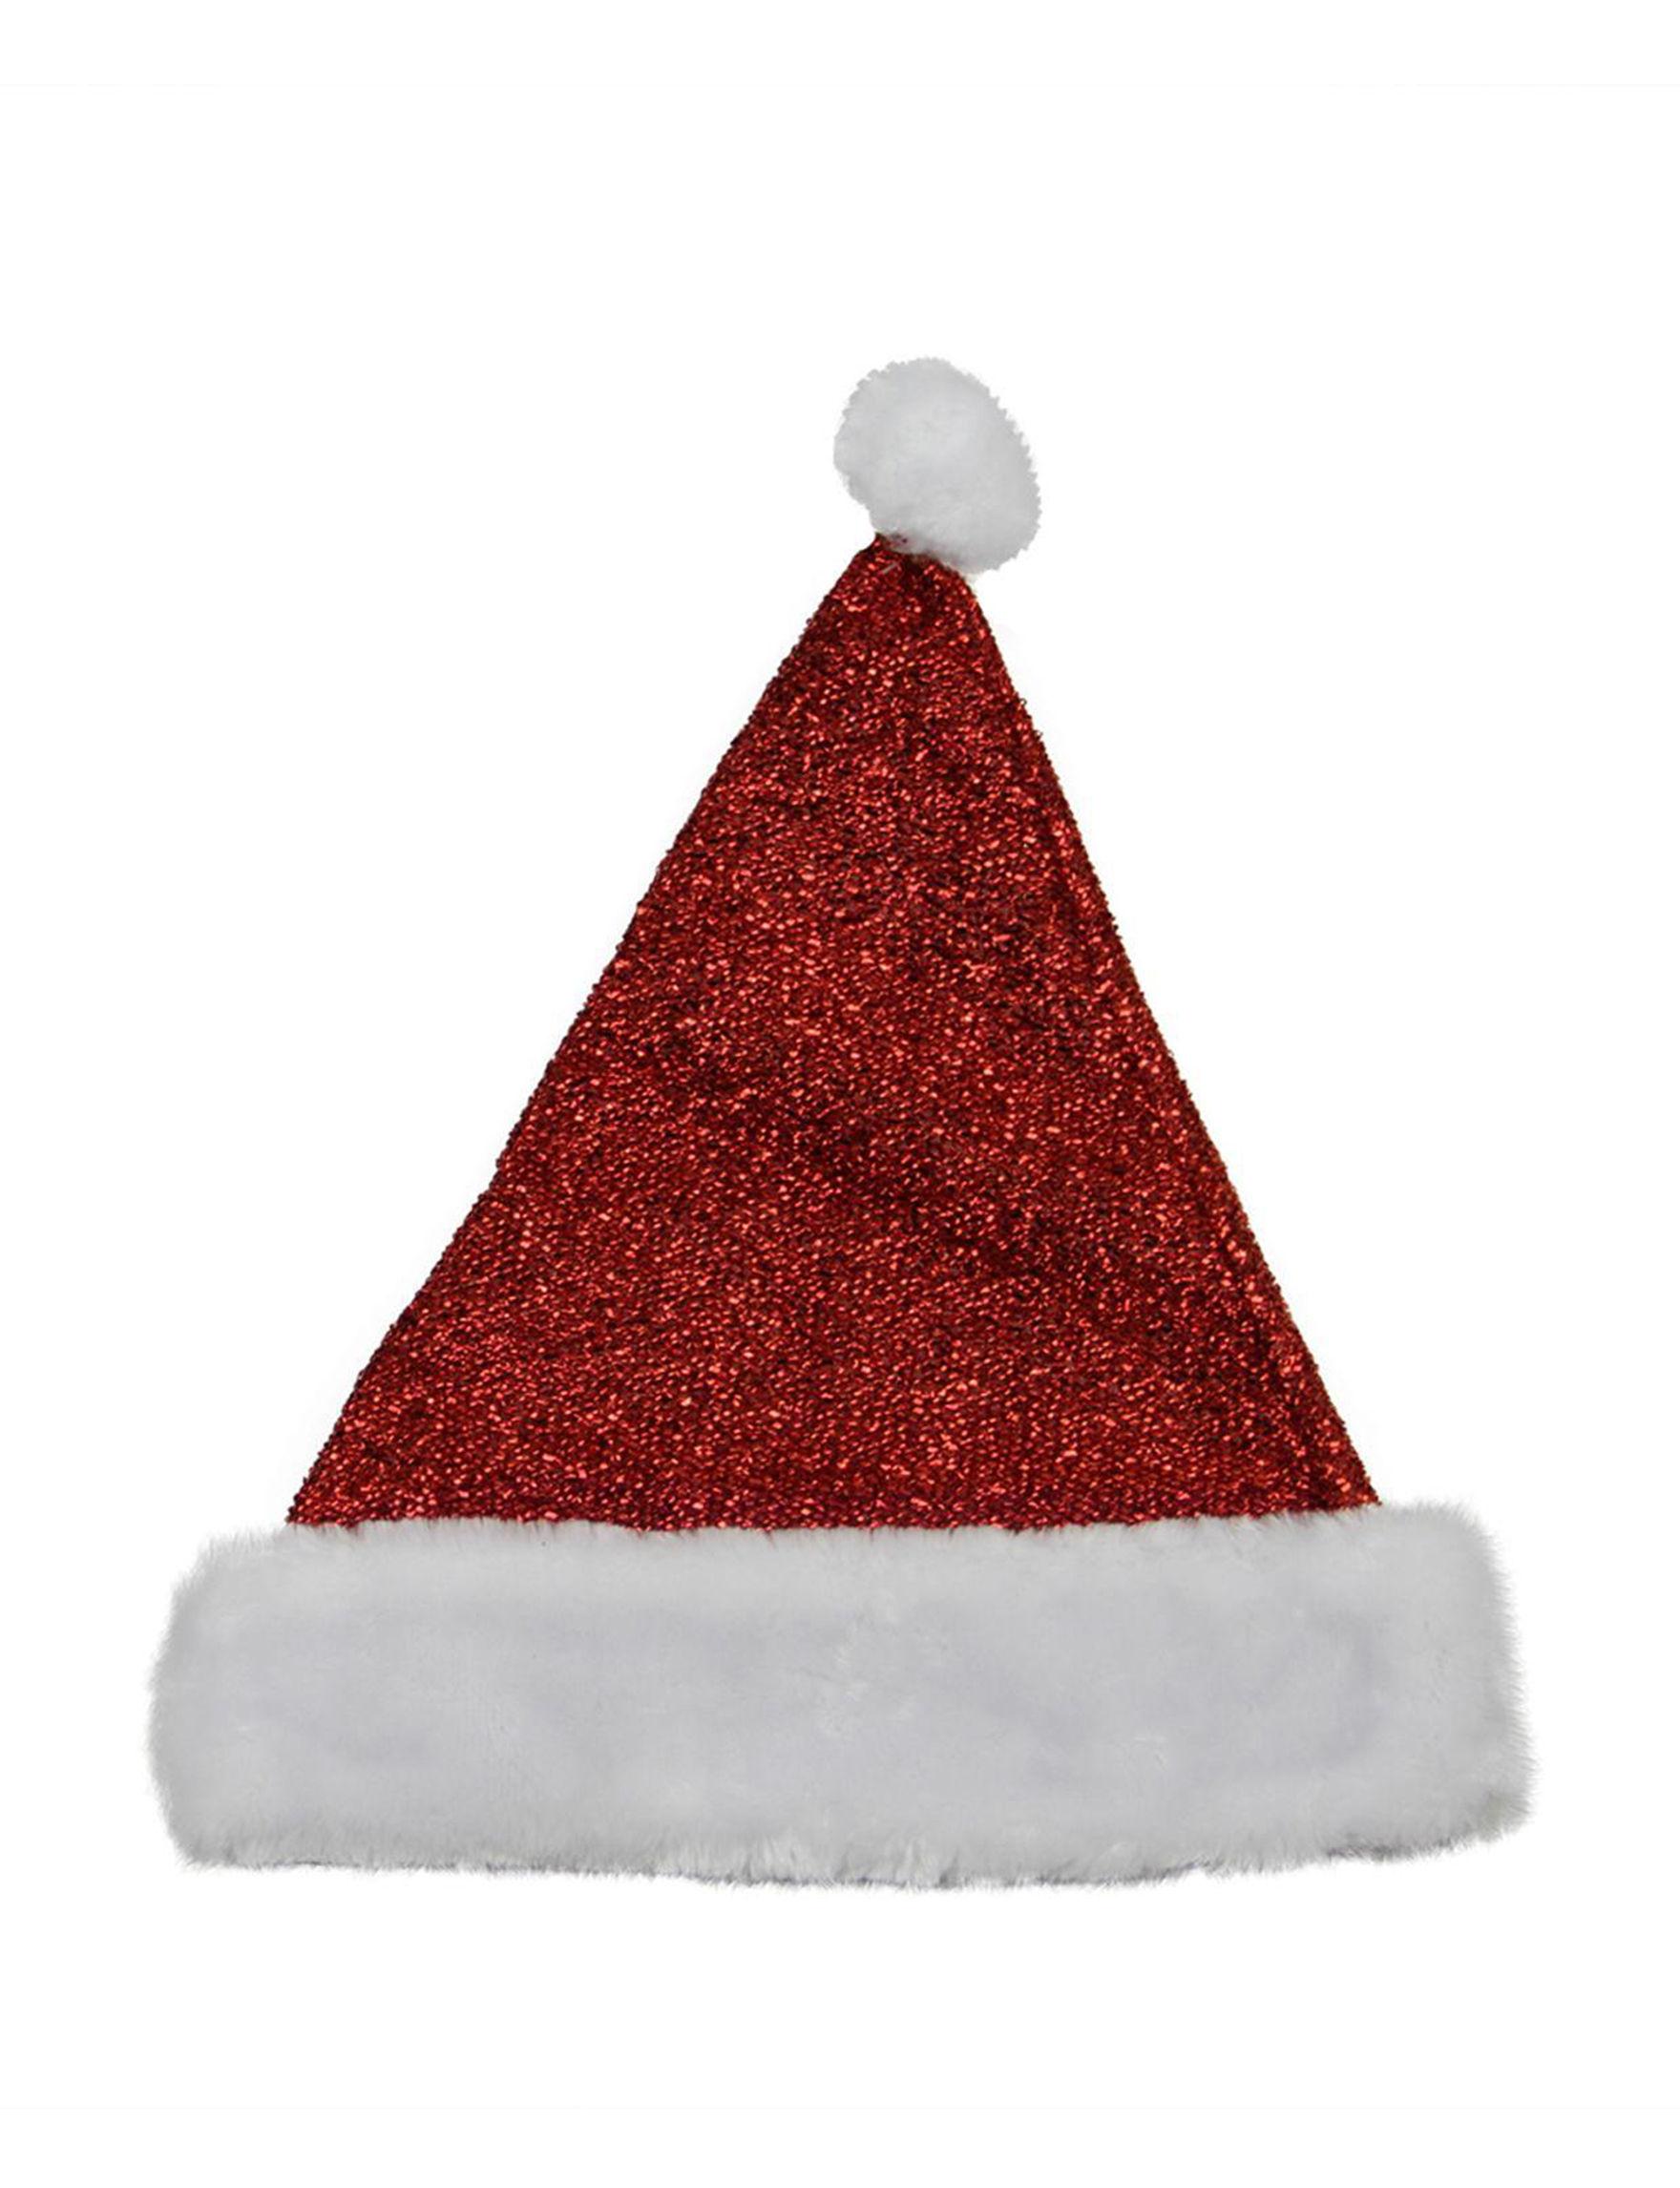 Northlight Red Holiday Dining & Entertaining Holiday Decor